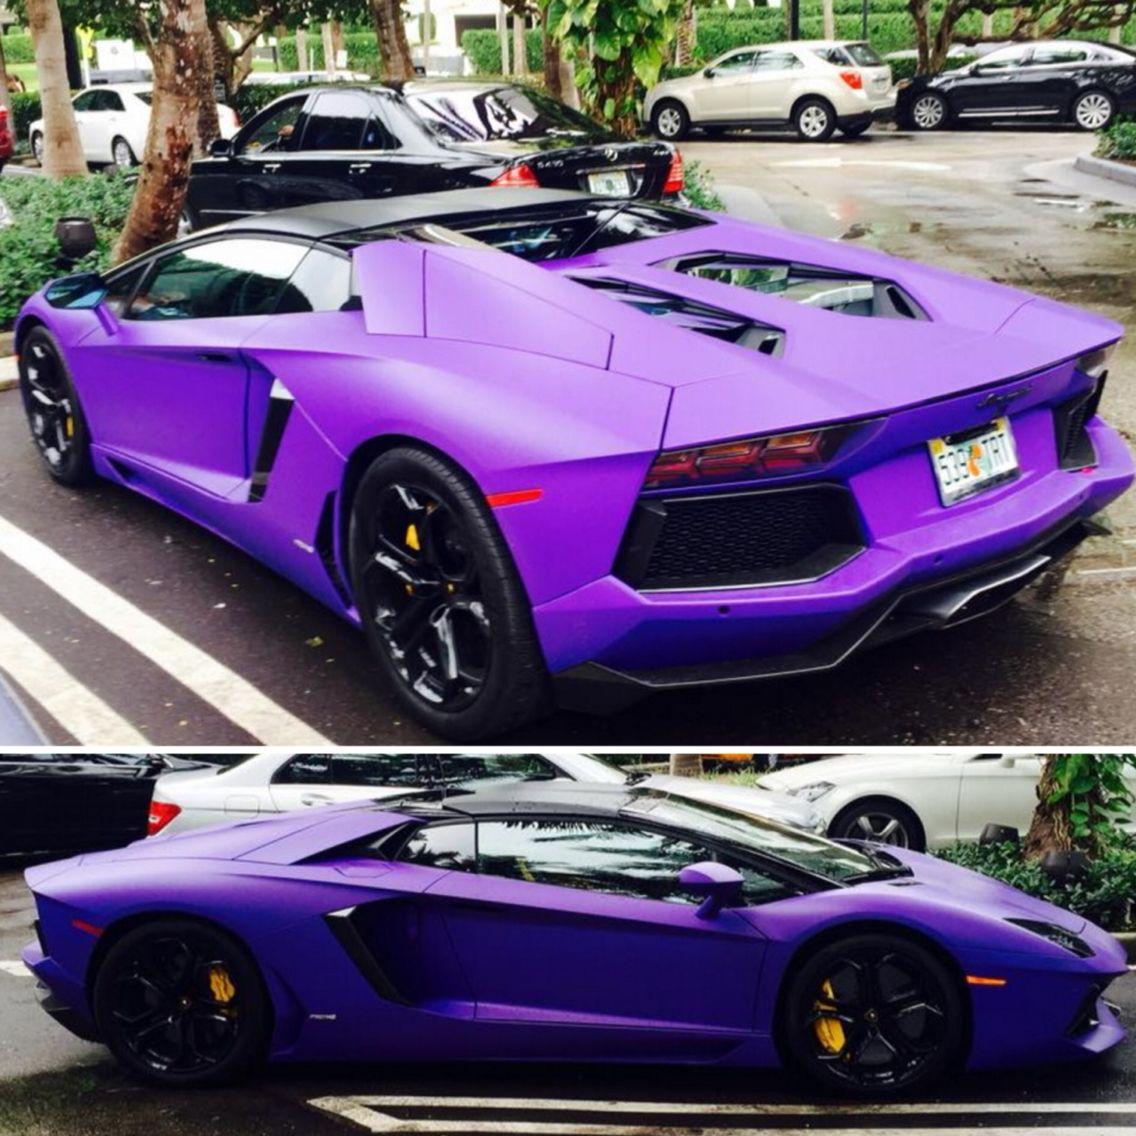 Purple Lamborghini Aventador Roadster on lamborghini huracan, lamborghini gallardo roadster, lamborghini miura, lamborghini sesto elemento, lamborghini countach, lamborghini estoque, nissan 370z roadster, mercedes slr mclaren roadster, lamborghini replica, mercedes sls amg roadster, lamborghini diablo, lamborghini reventon, murcielago roadster, lamborghini murcielago, lexus lfa roadster, lamborghini veneno, pagani zonda roadster, zonda f roadster, lamborghini egoista, bugatti roadster,